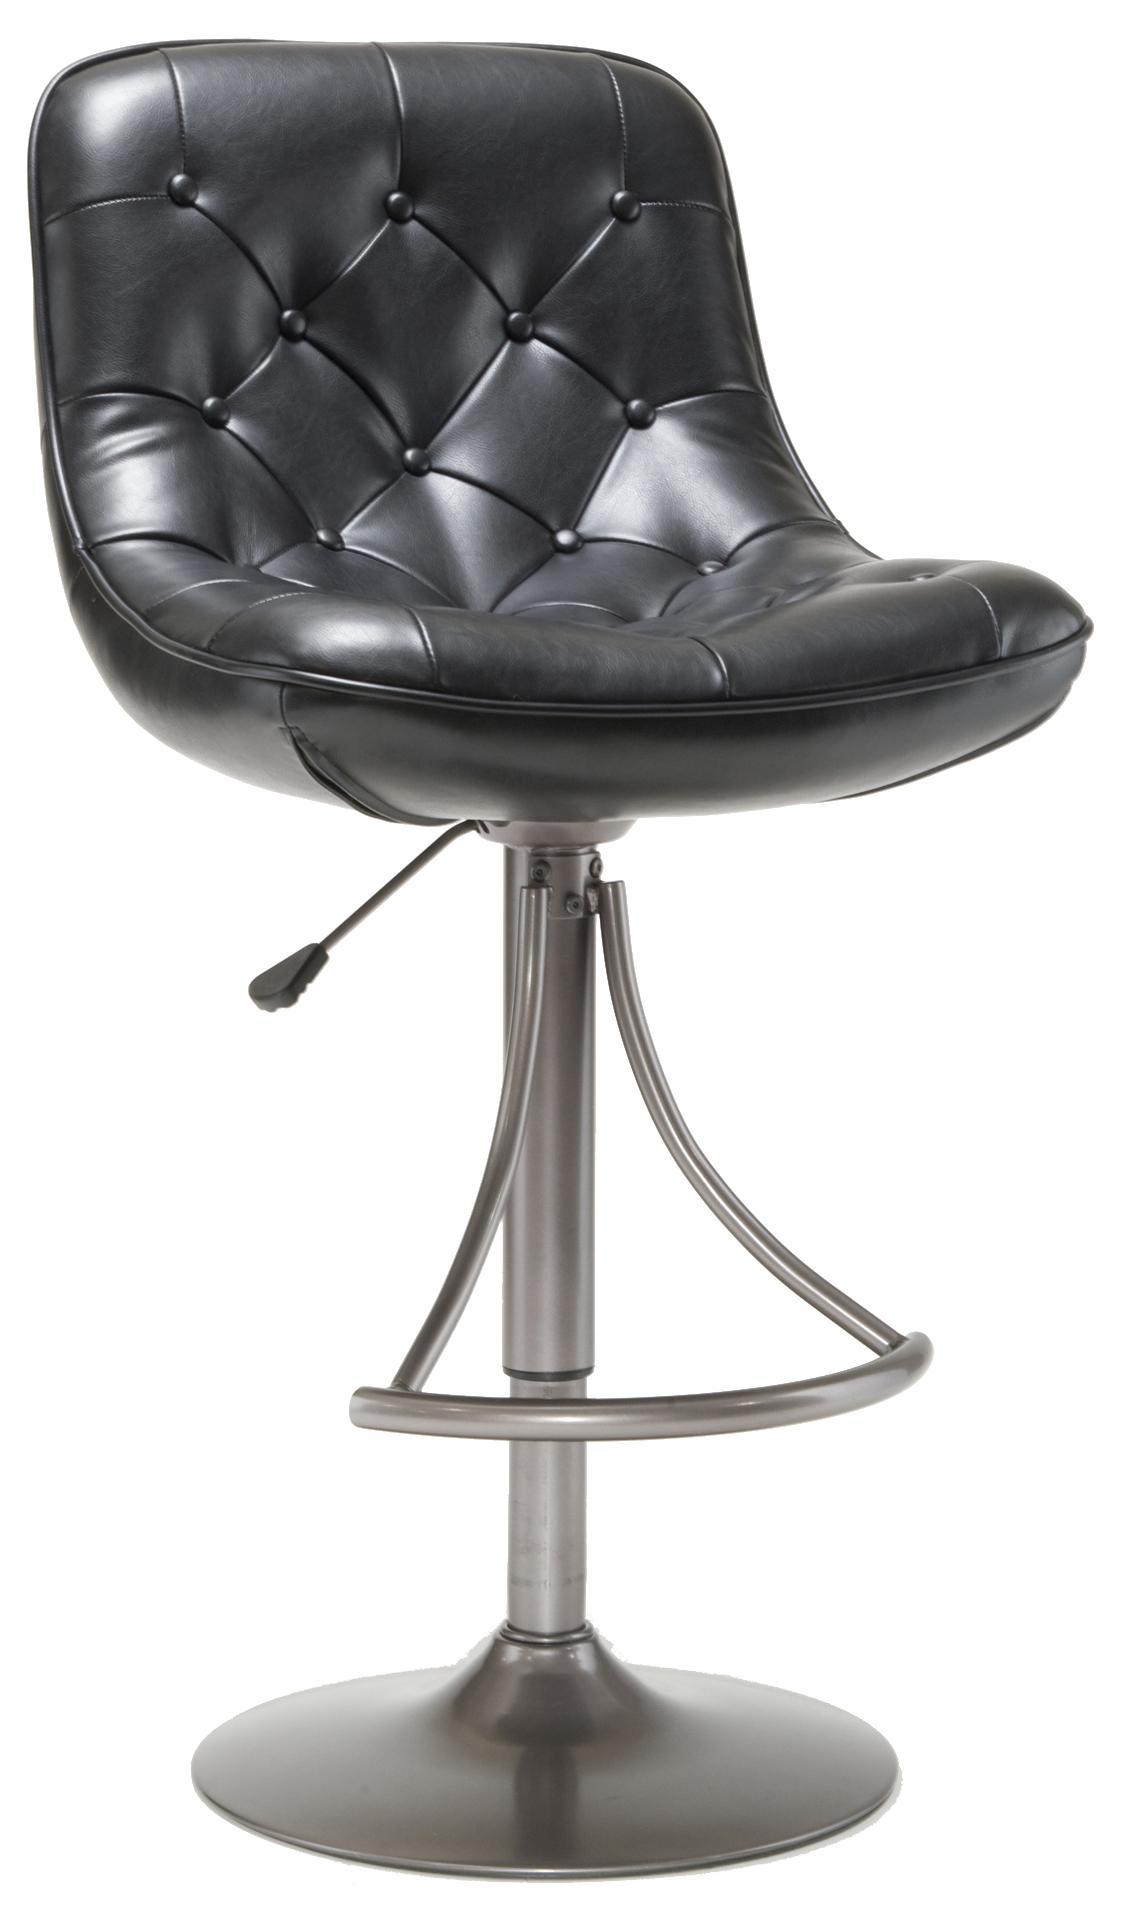 Hillsdale Metal Stools Adjustable Height Oyster Grey Aspen Barstool - Item Number: 4290-830